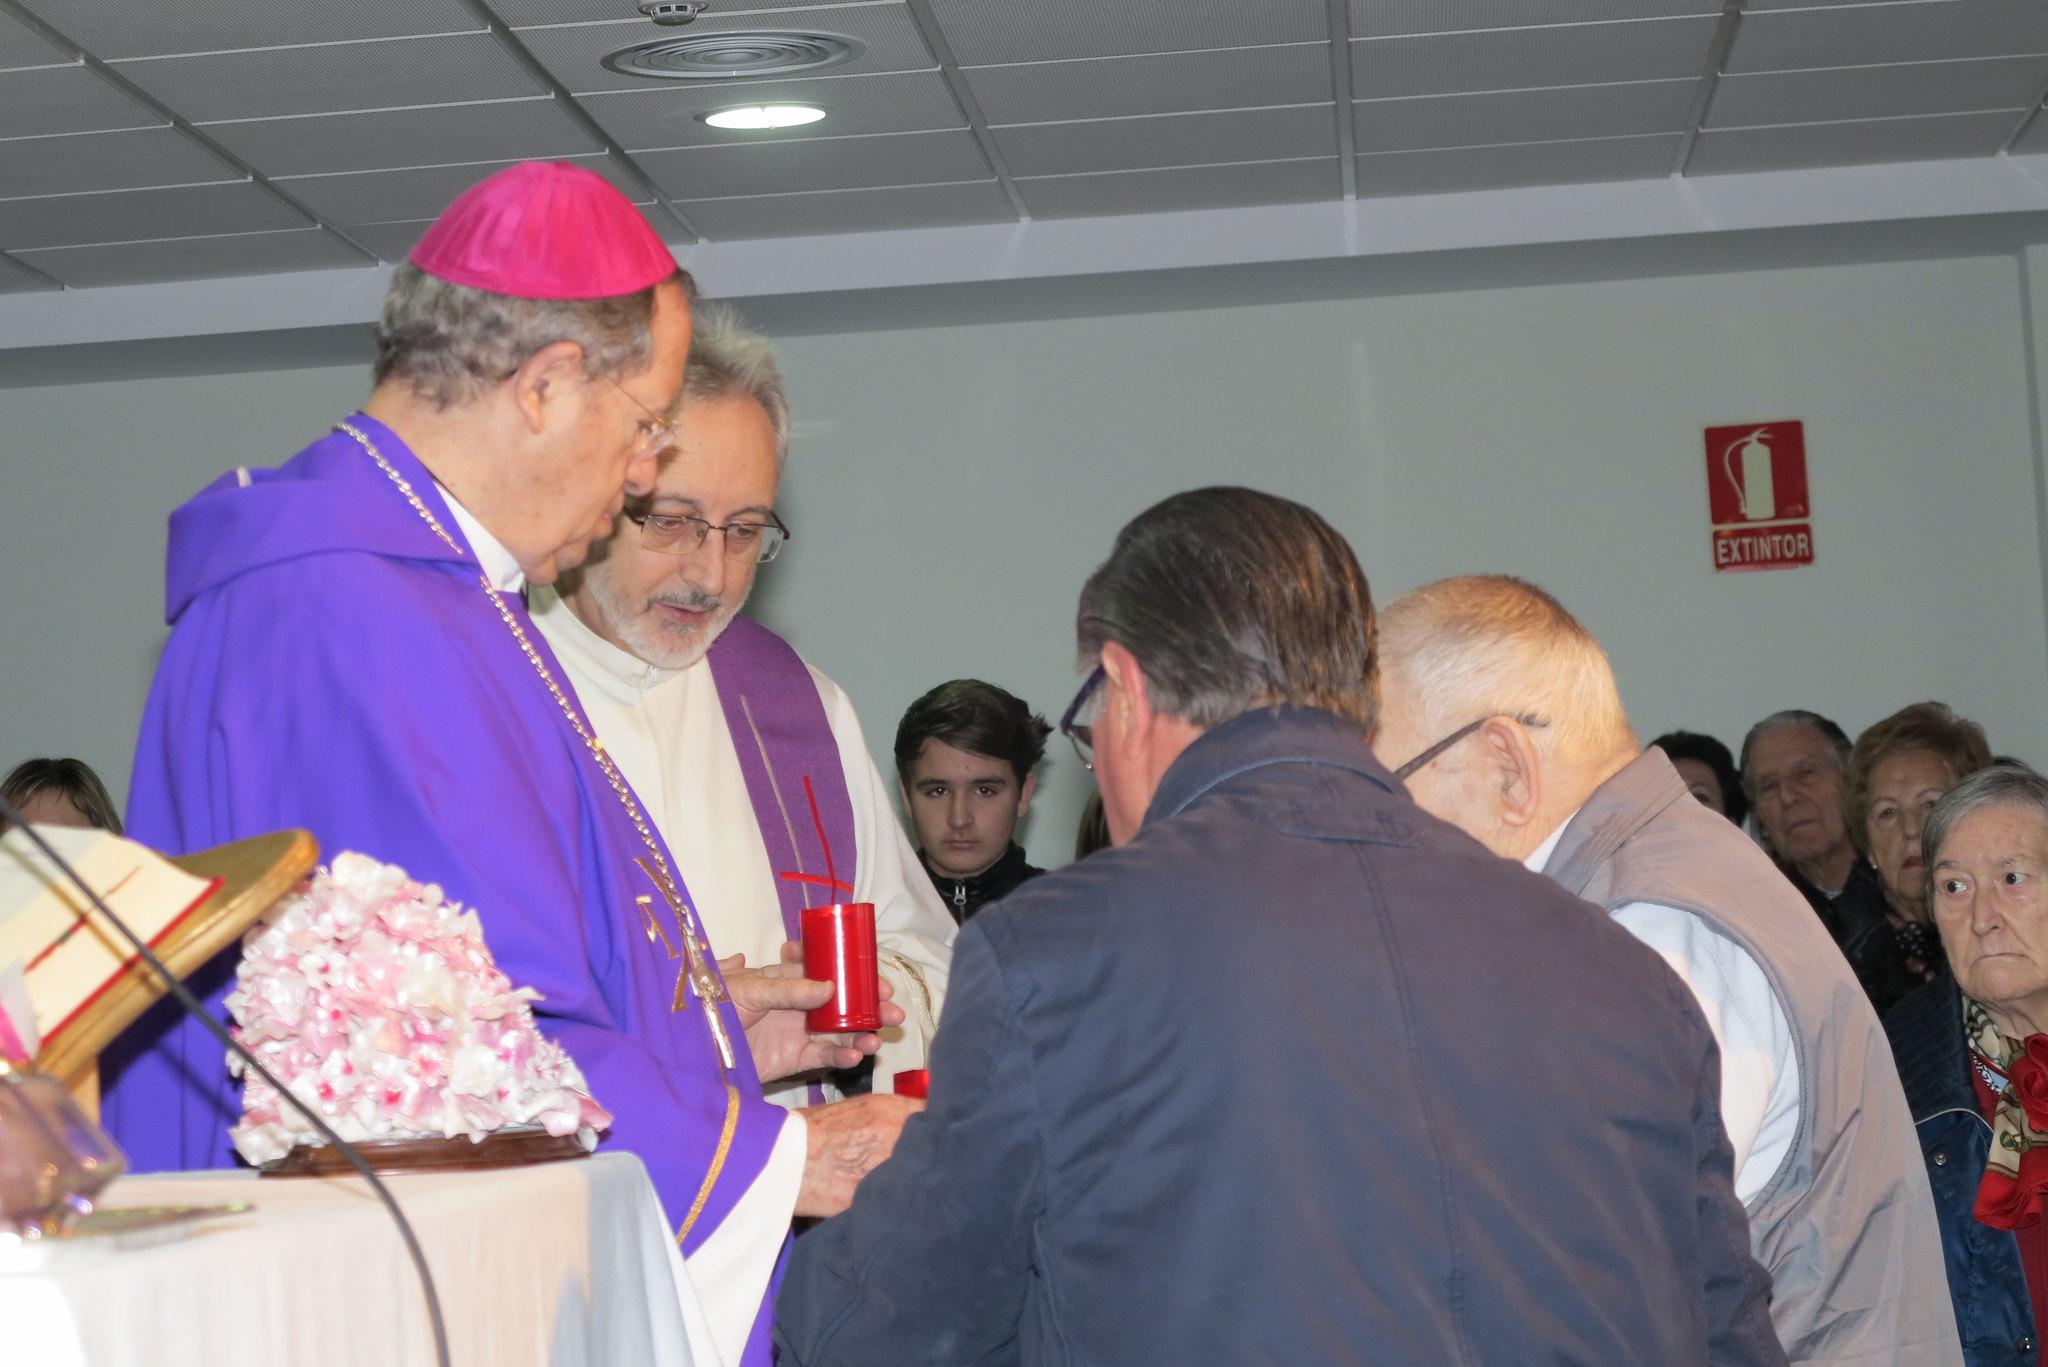 (2016-02-13) - Inauguración Virgen de Lourdes, La Molineta - Archivo La Molineta 2 (21)